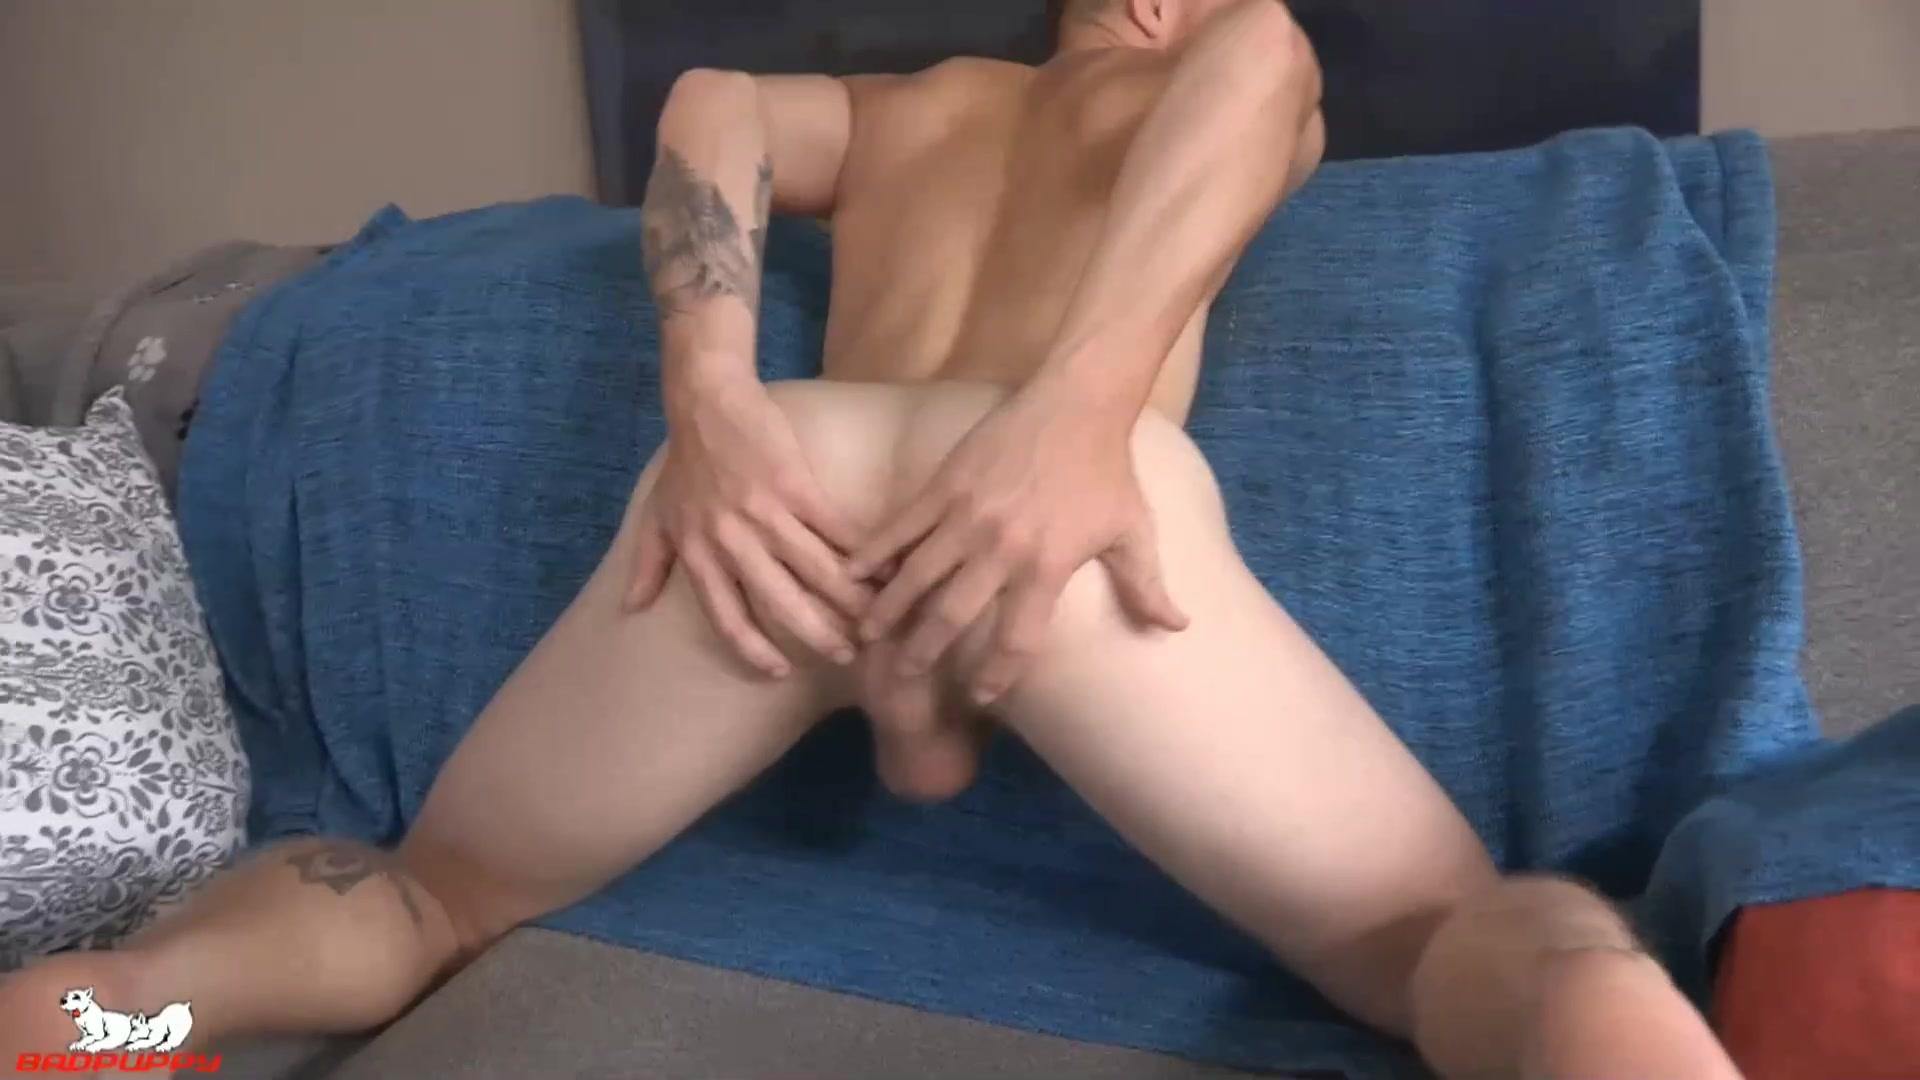 Zach Covington - Badpuppy free cartoon 3d monster porn videos